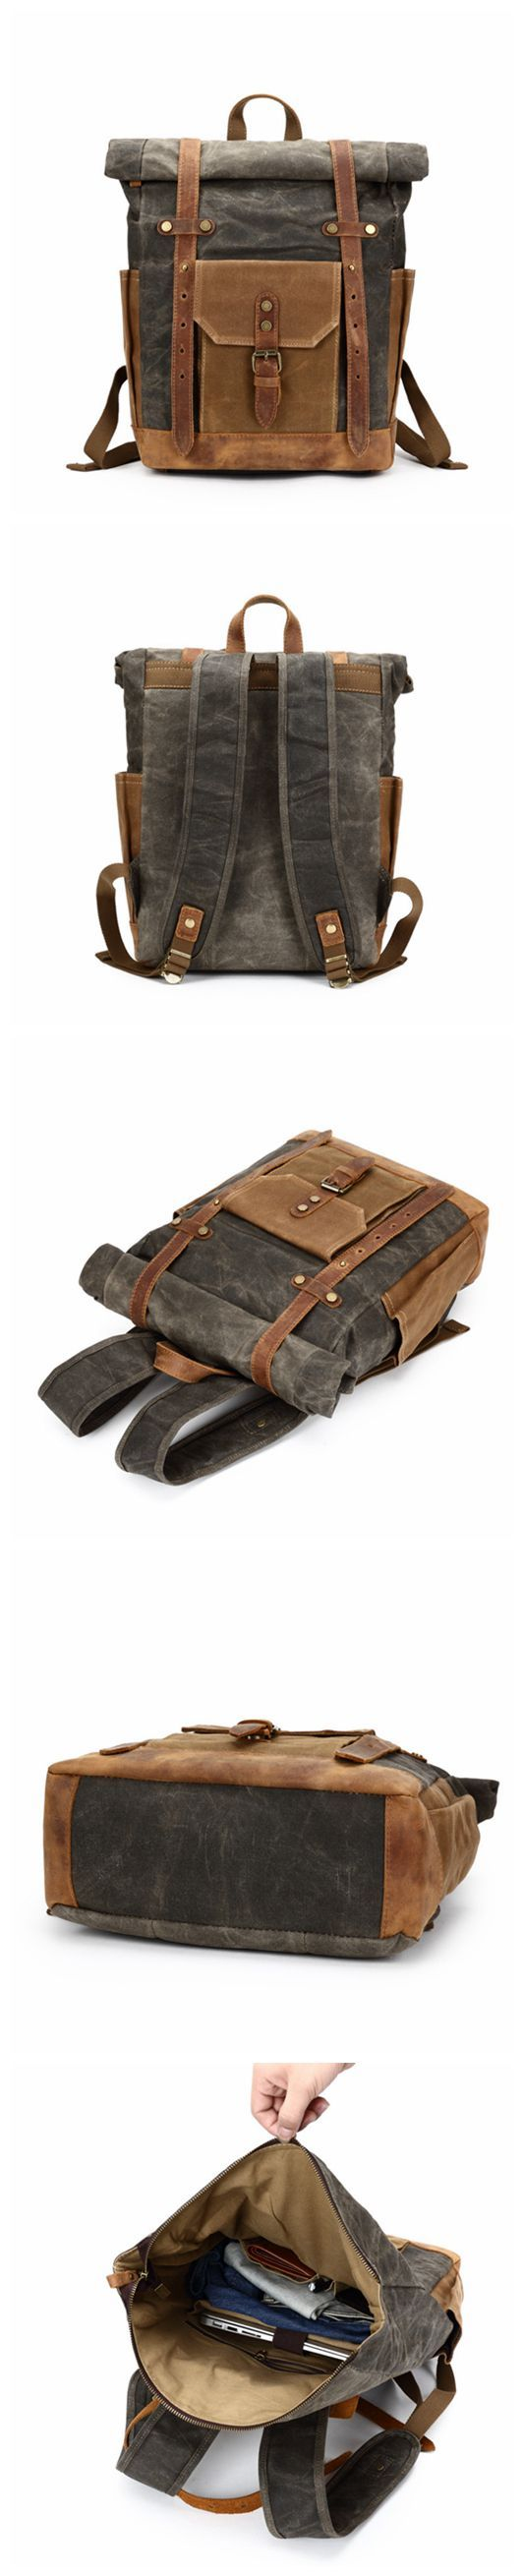 Waxed Canvas Backpack, Rucksack, Travel Backpack 8808